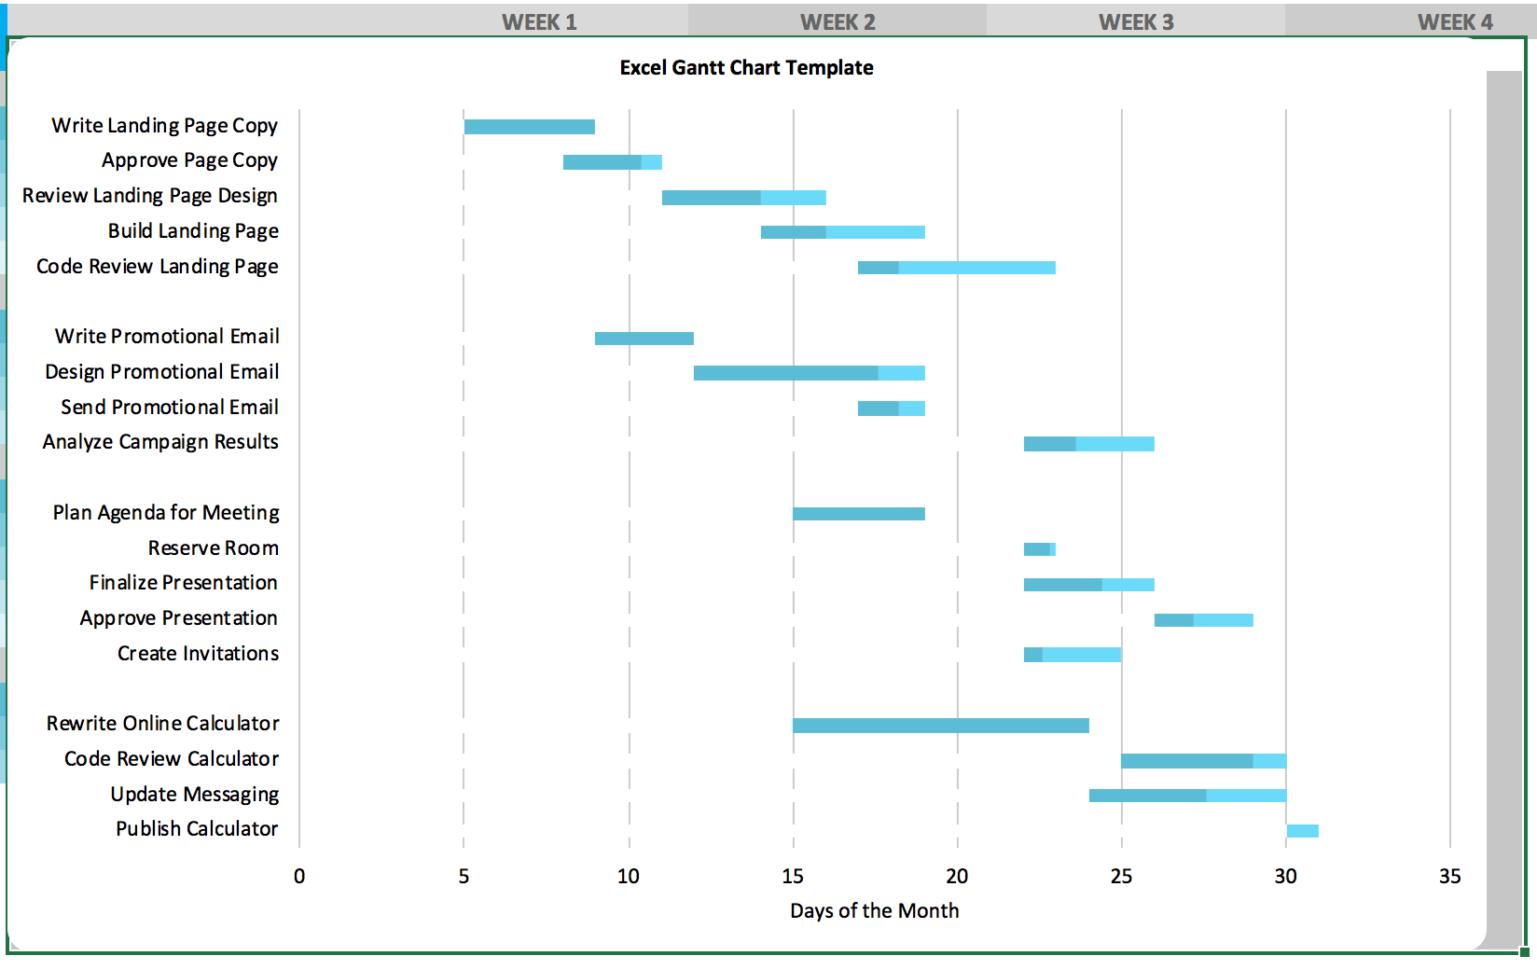 Free Gantt Chart Excel Template: Download Now | Teamgantt In Gantt Chart Template